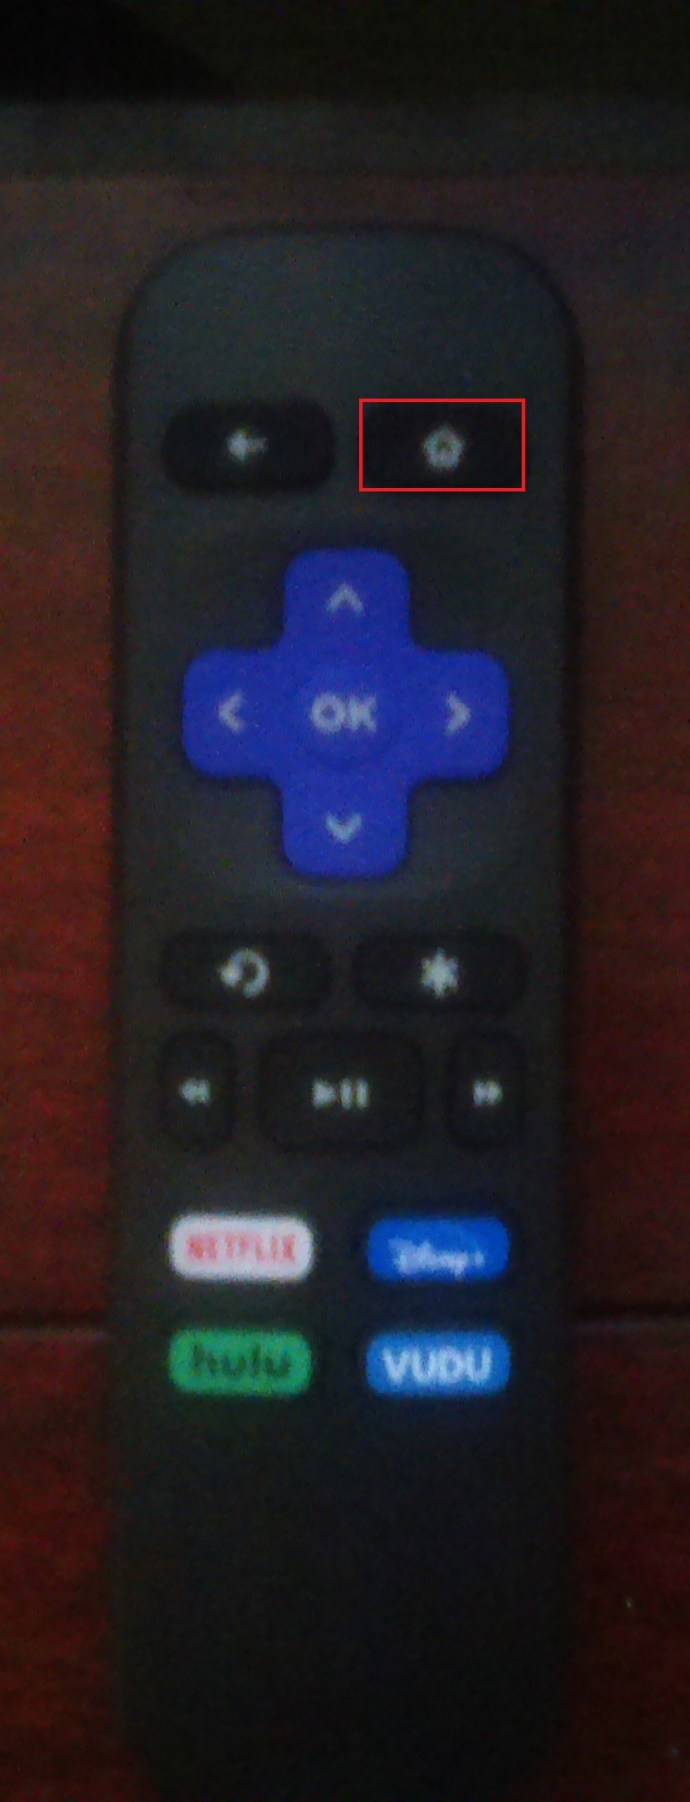 Roku Remote Home Button